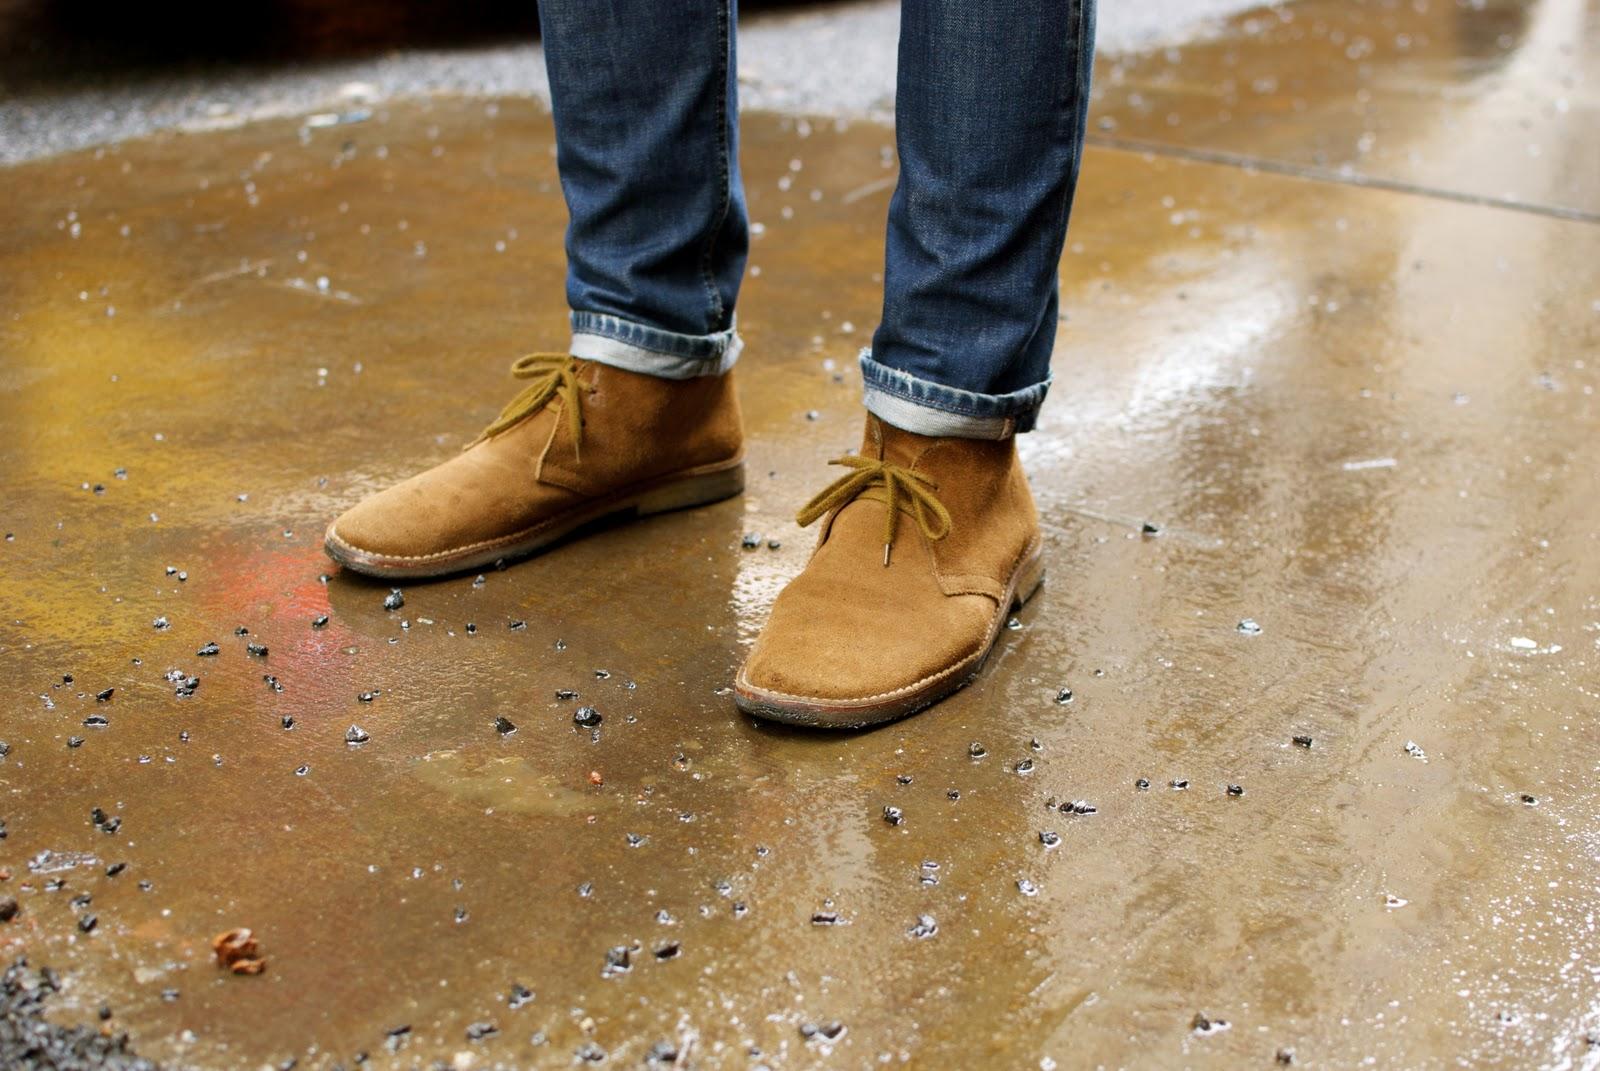 Can You Use Shoe Polish On Fake Leather